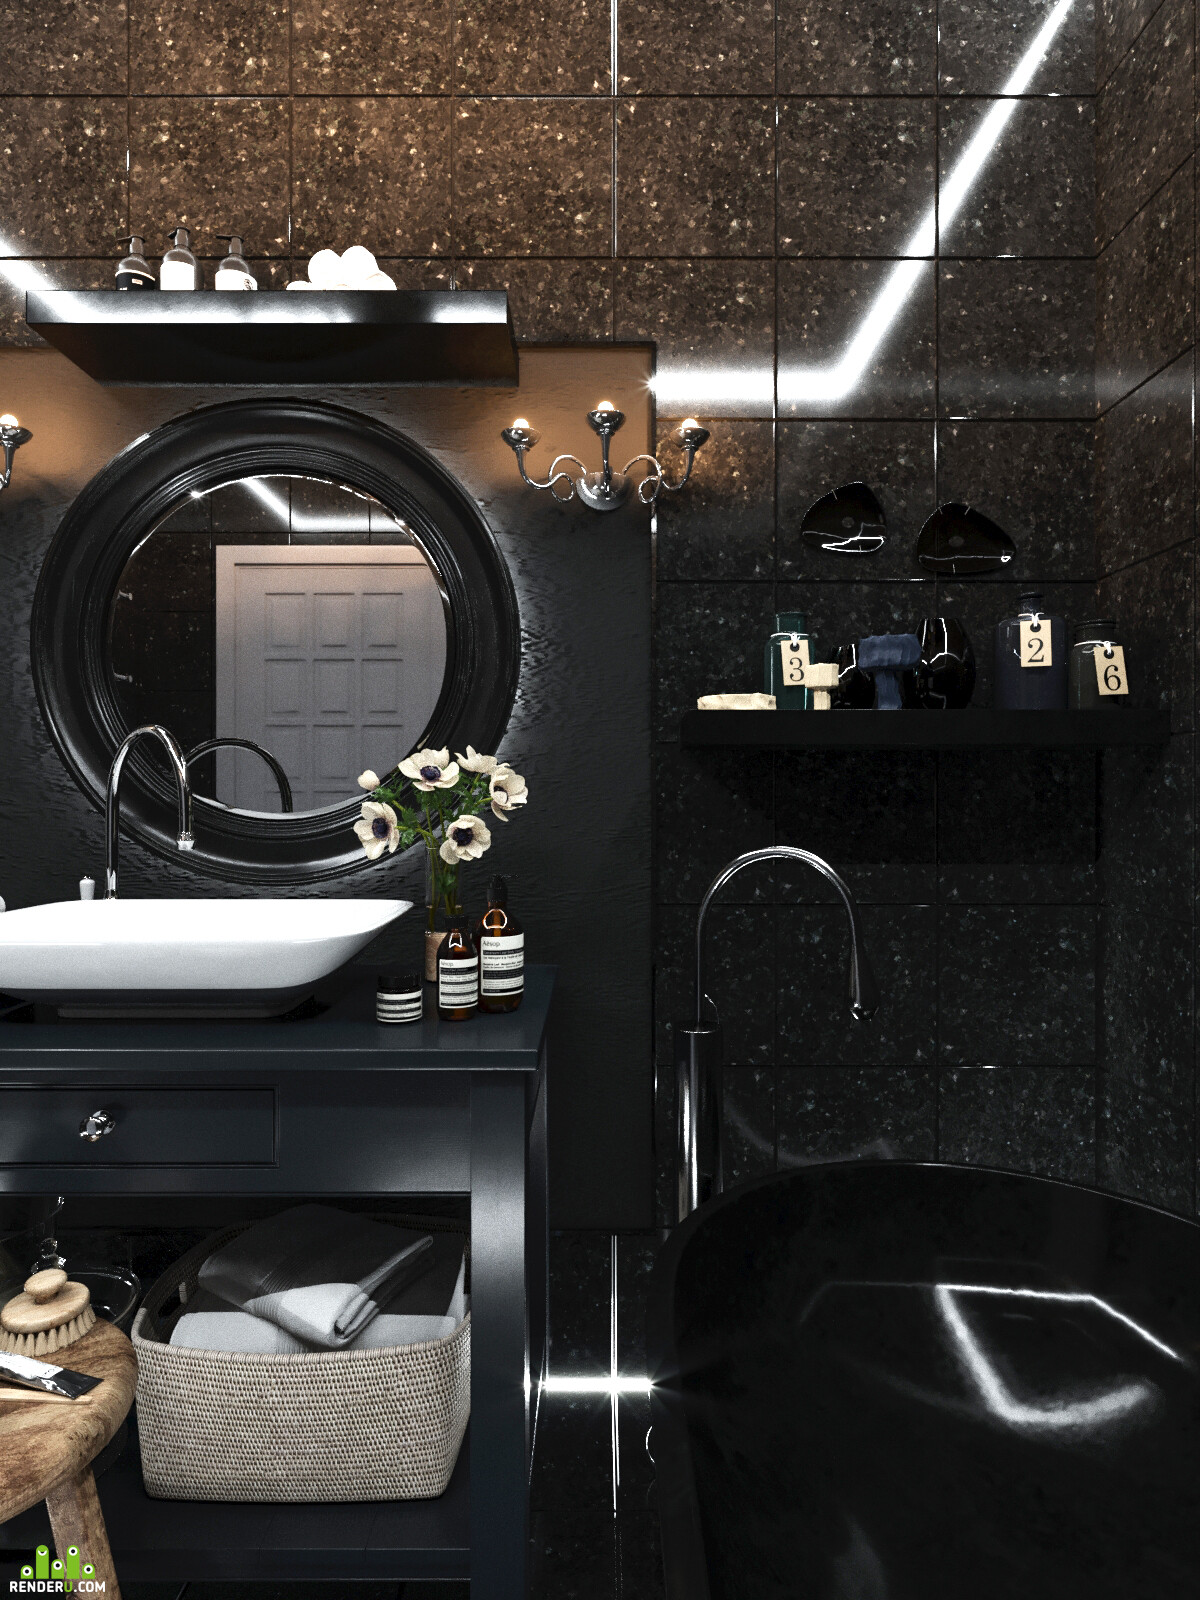 визуализация, 3д визуализация, 3d визуализация, Интерьерная визуализация, визуализация ванной, визуализация интерьера, дизайн ванной, готический стиль